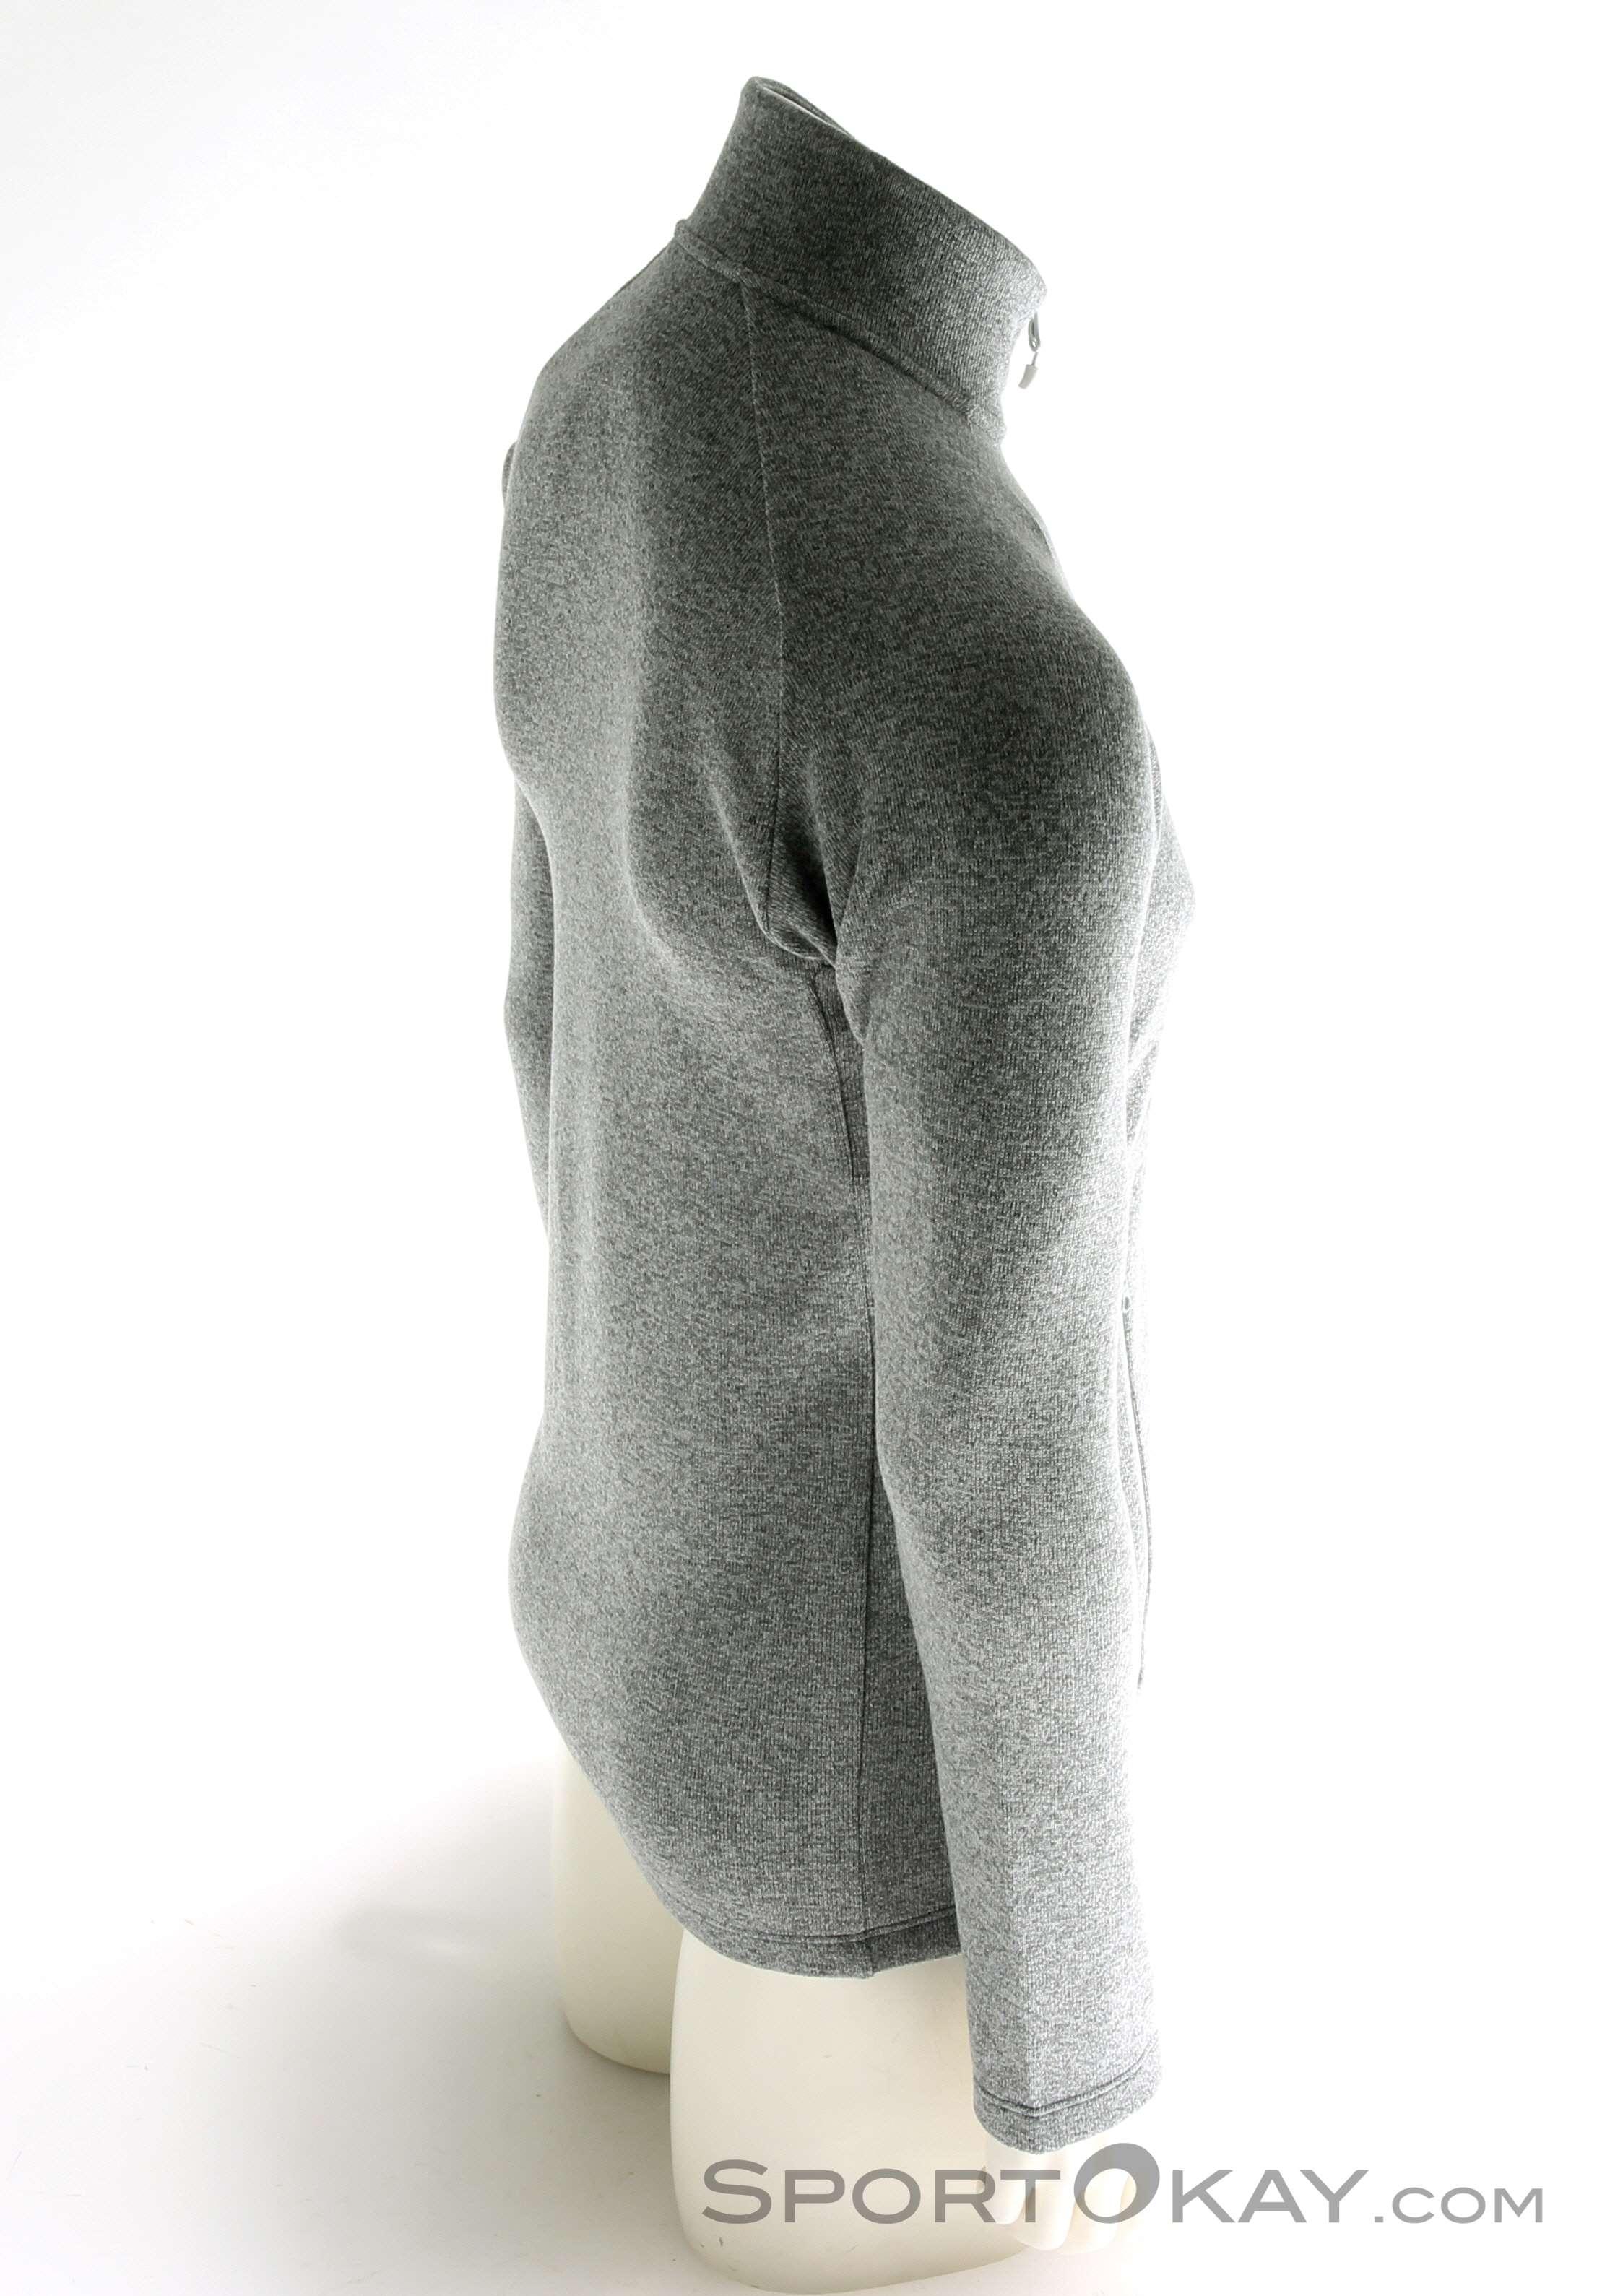 Jacket Maglie Nimble Abbigliamento Haglöfs Uomo Outdoor Maglia 8xSZWqUwR